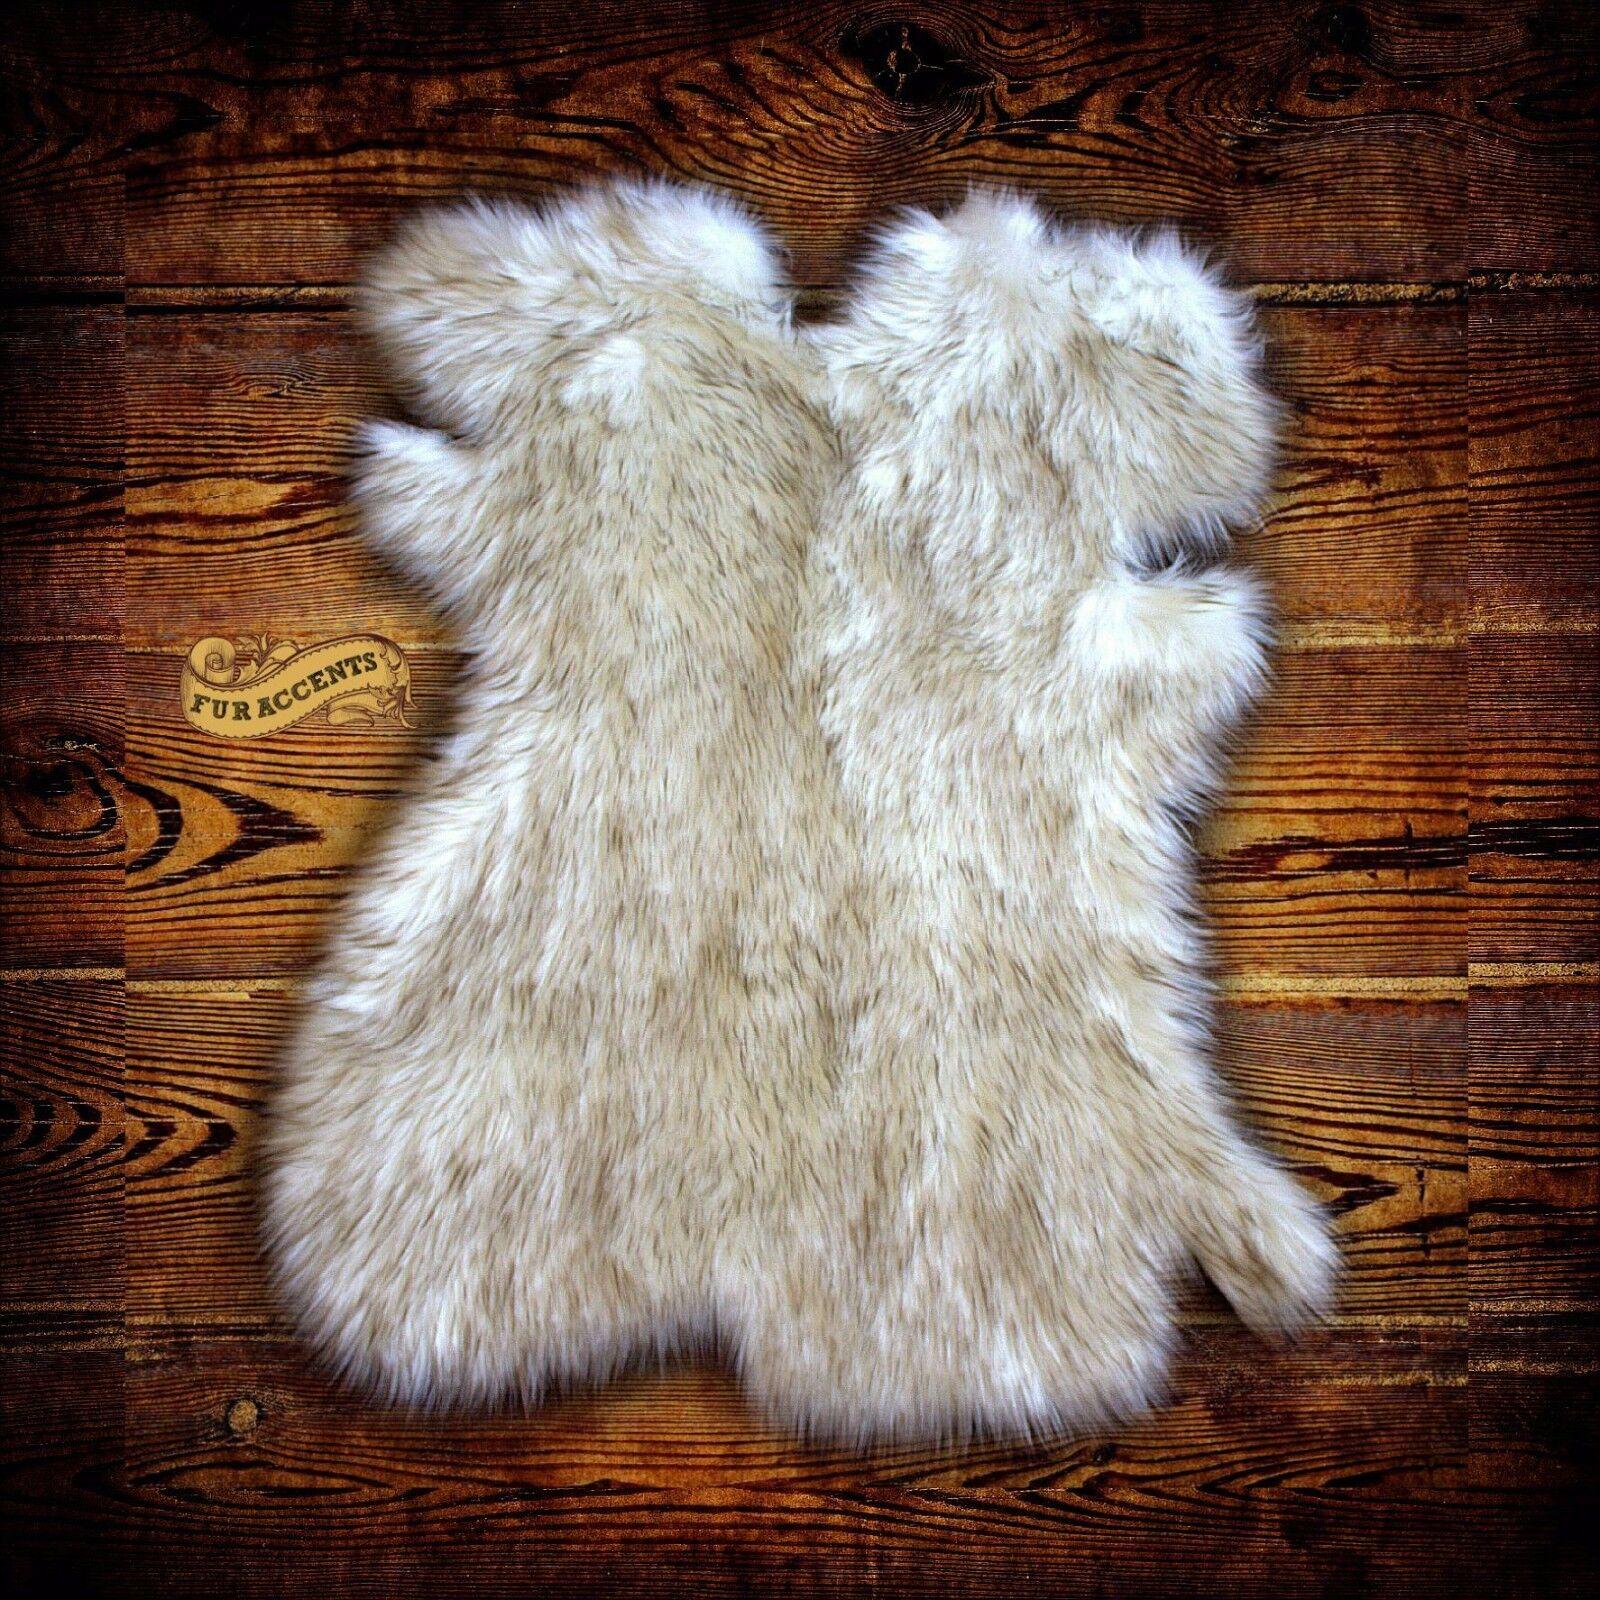 Arctic Fox Throw Rug - Plush Faux Fur - bianca w  Marronee Accents - New Pelt Design